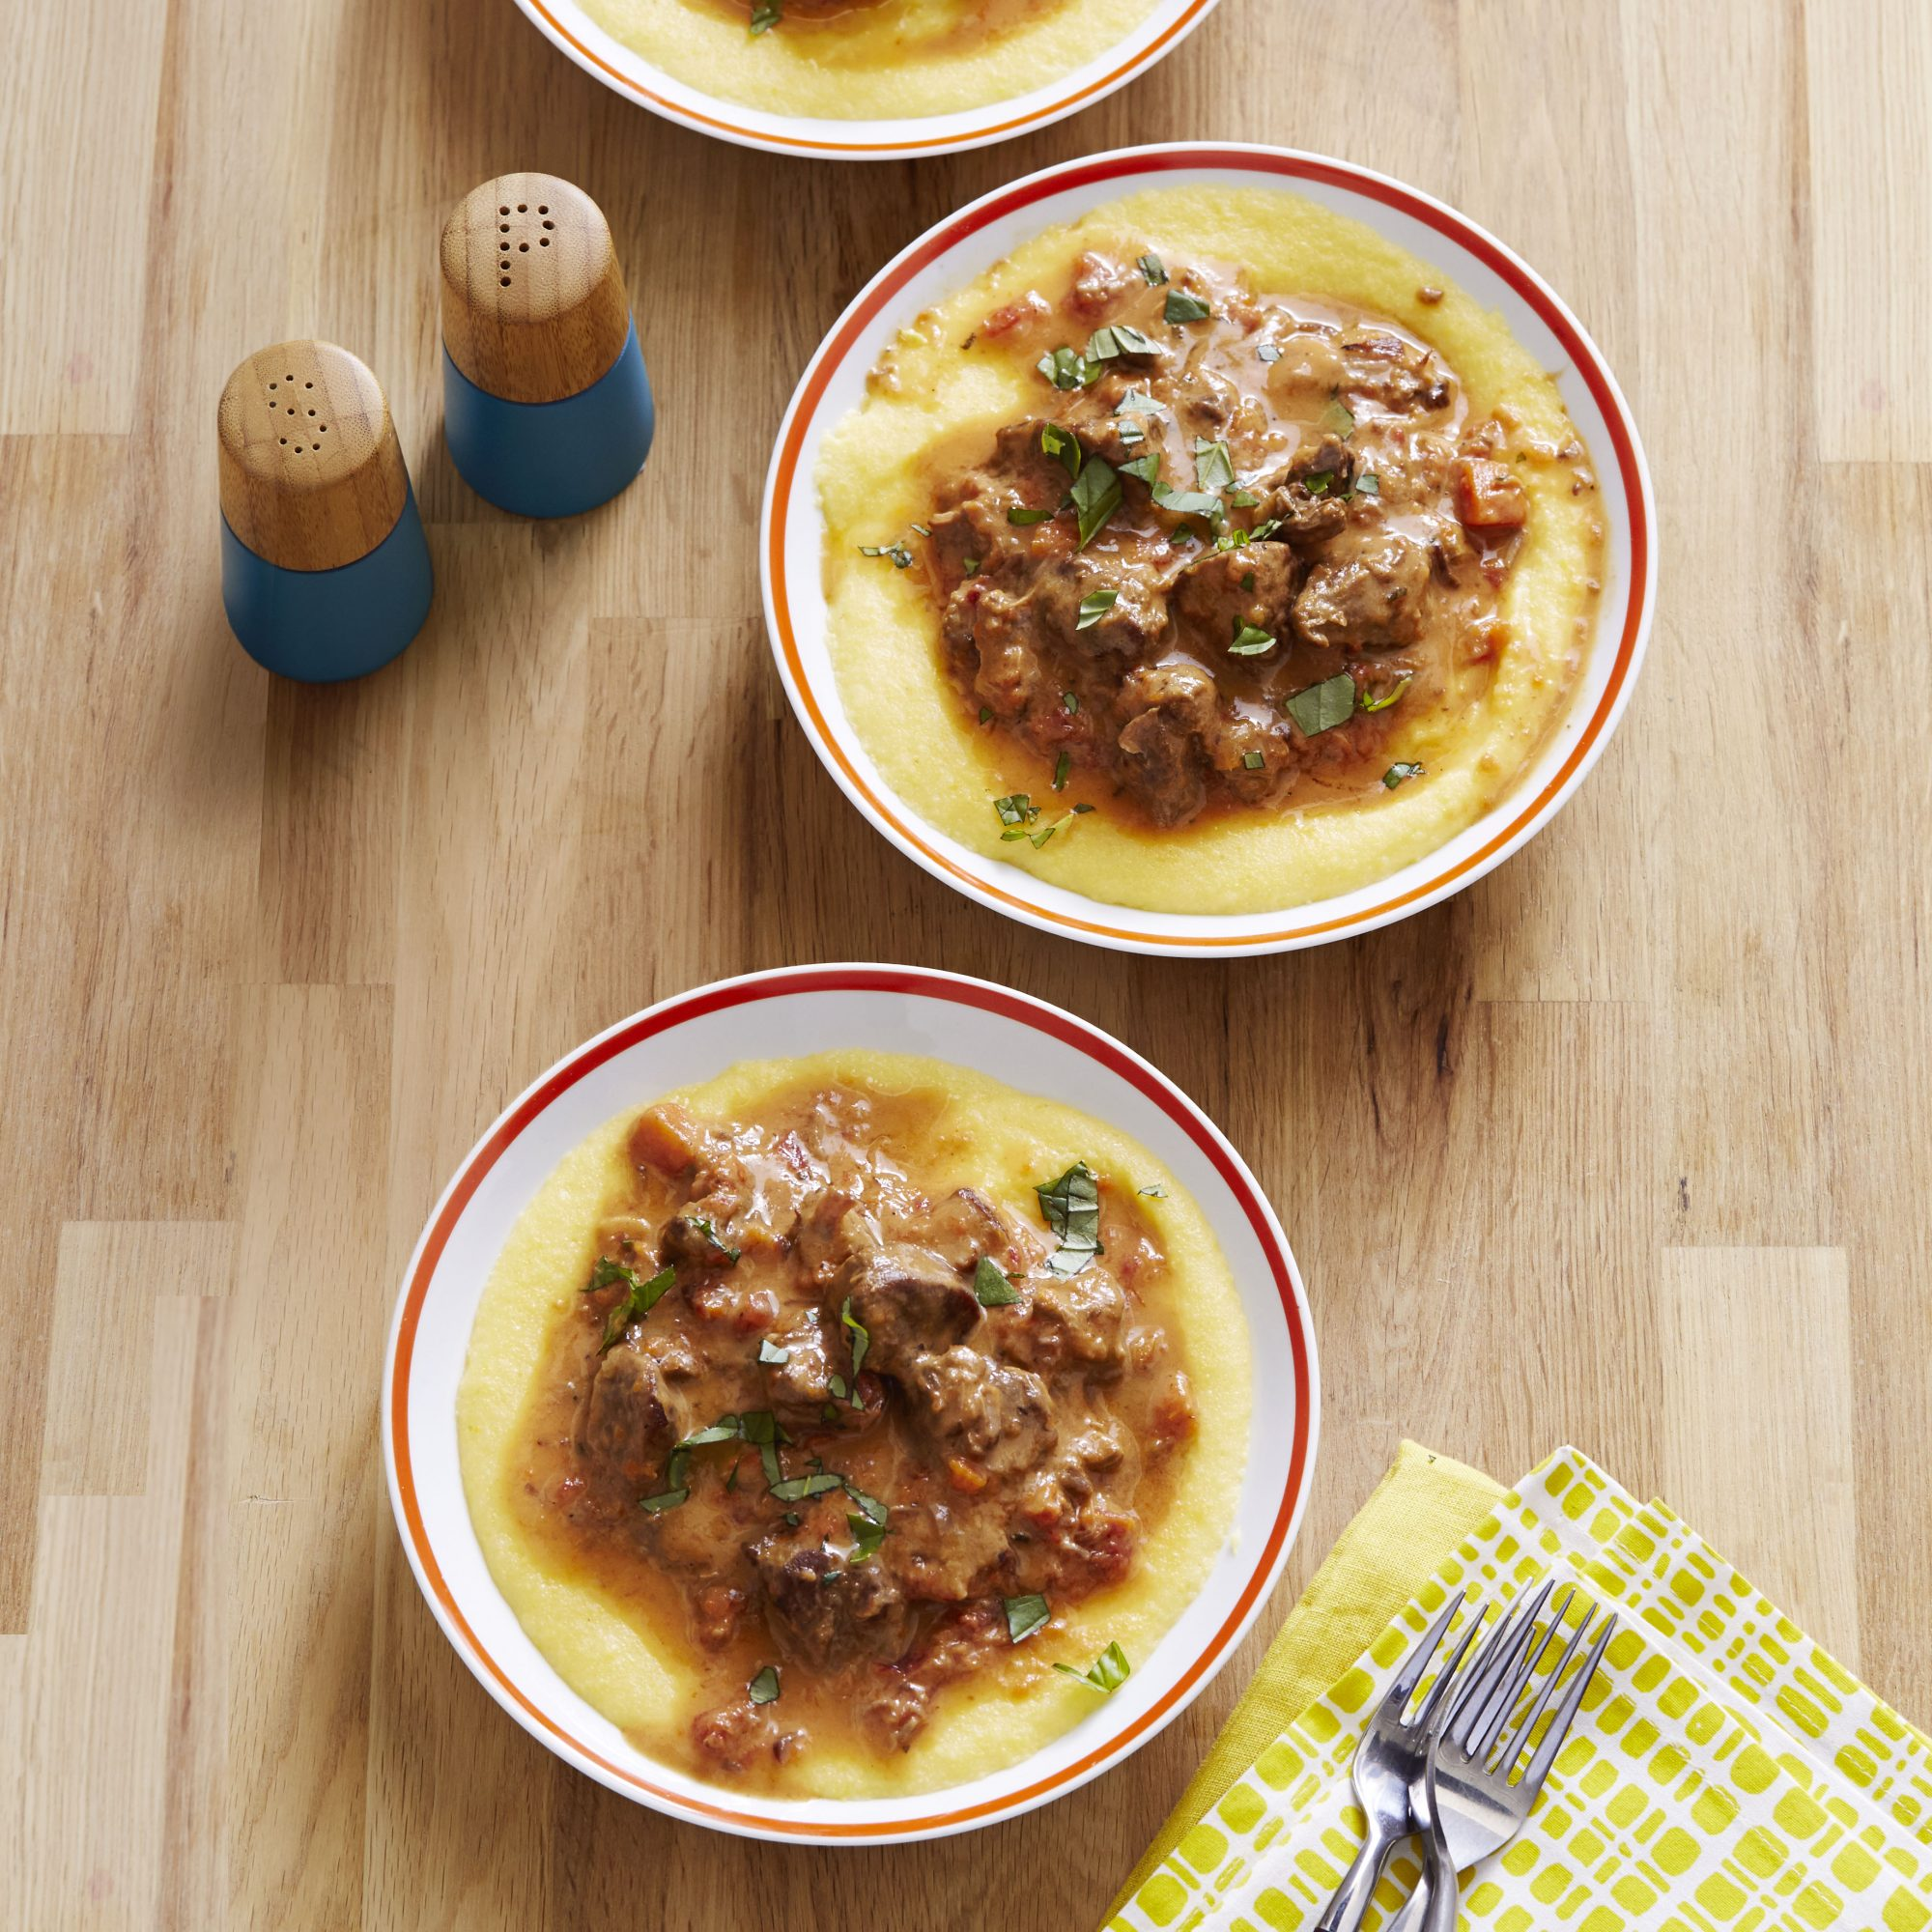 Lamb Stew with Polenta